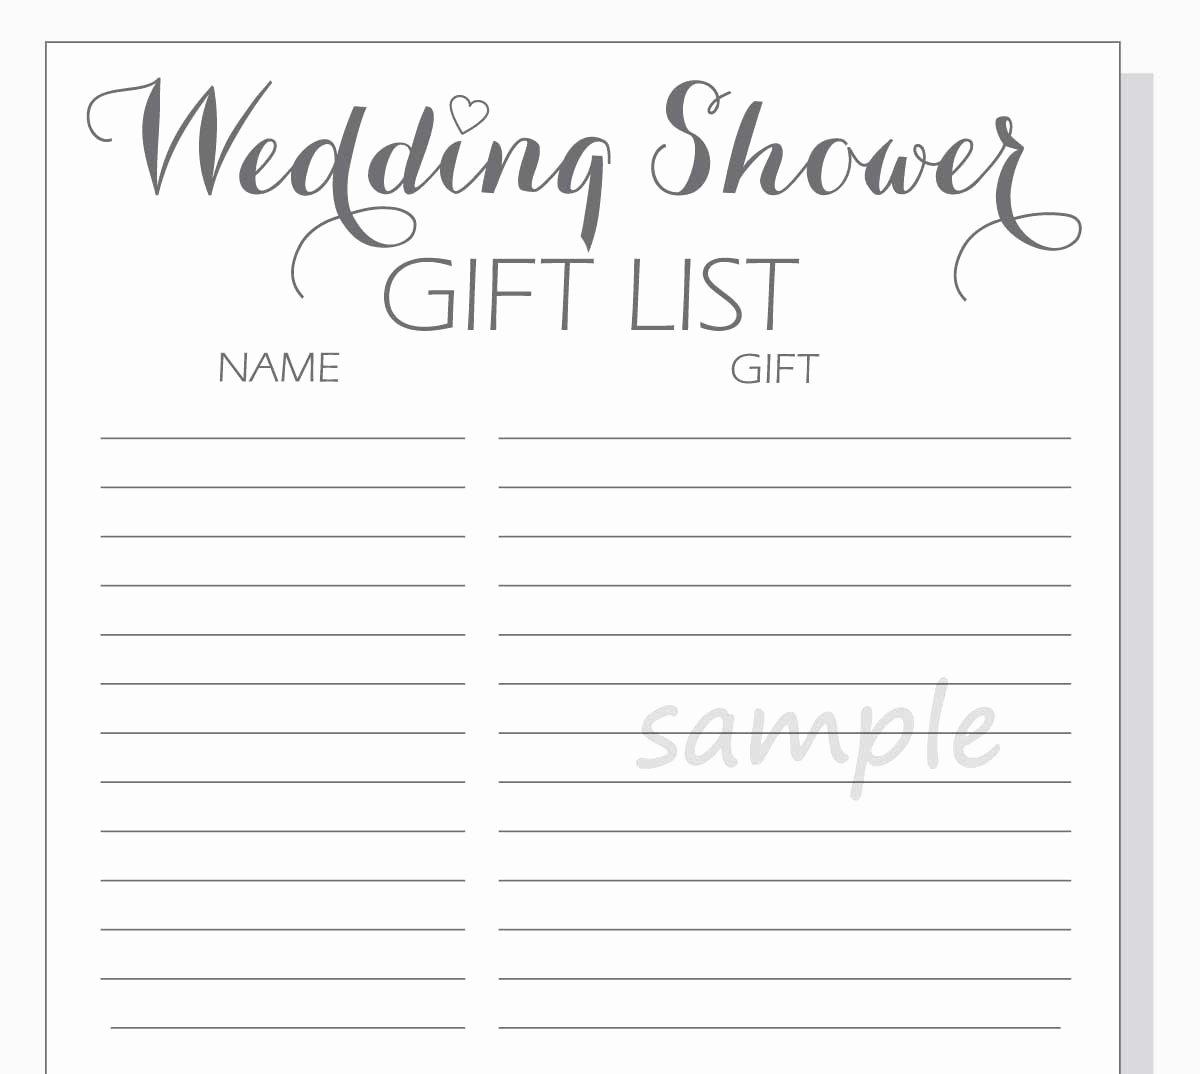 Bridal Shower Checklist Template Inspirational Diy Wedding Shower Gift List Printable Calligraphy Script